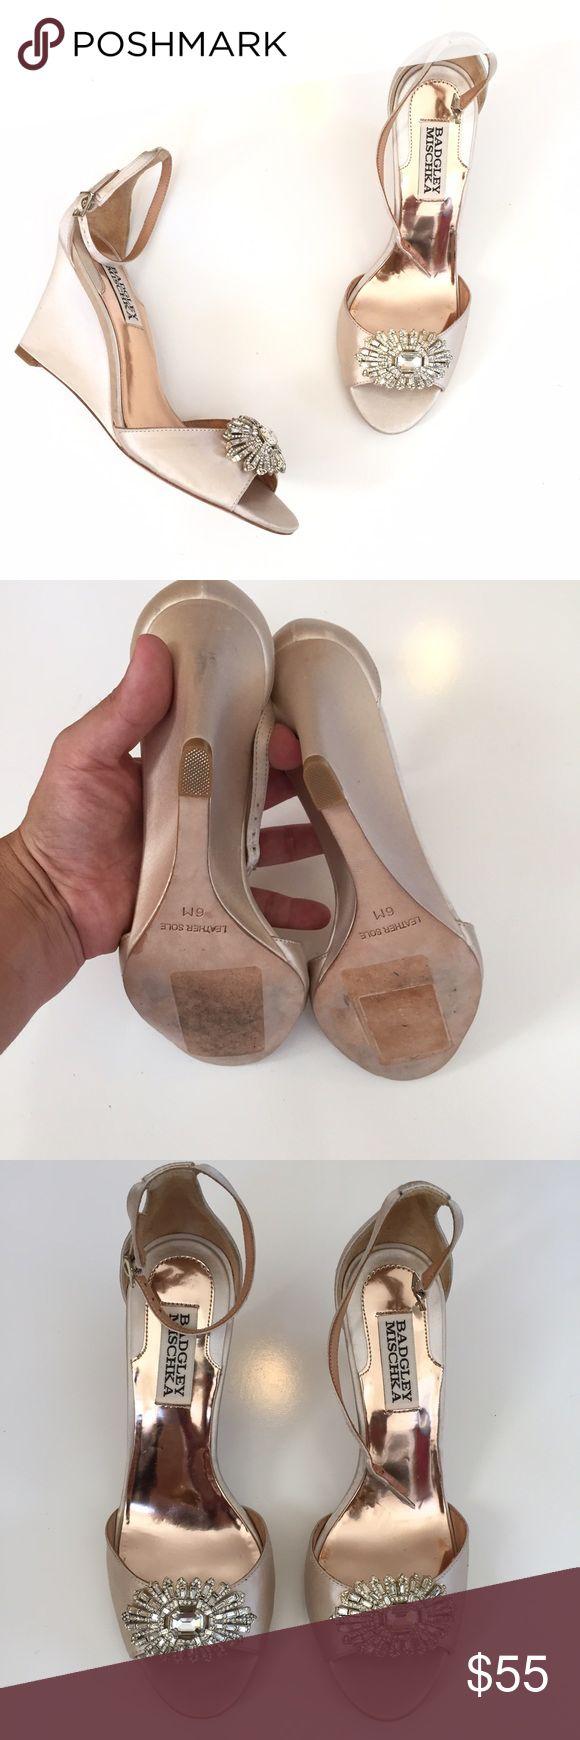 BADGLEY MISCHKA JEWELED PEEP TOE WEDGES SZ 6 new BADGLEY MISCHKA JEWELED PEEP TOE WEDGES SZ 6 new without box store display ! Back of the heel needs cleaning Adidas Shoes